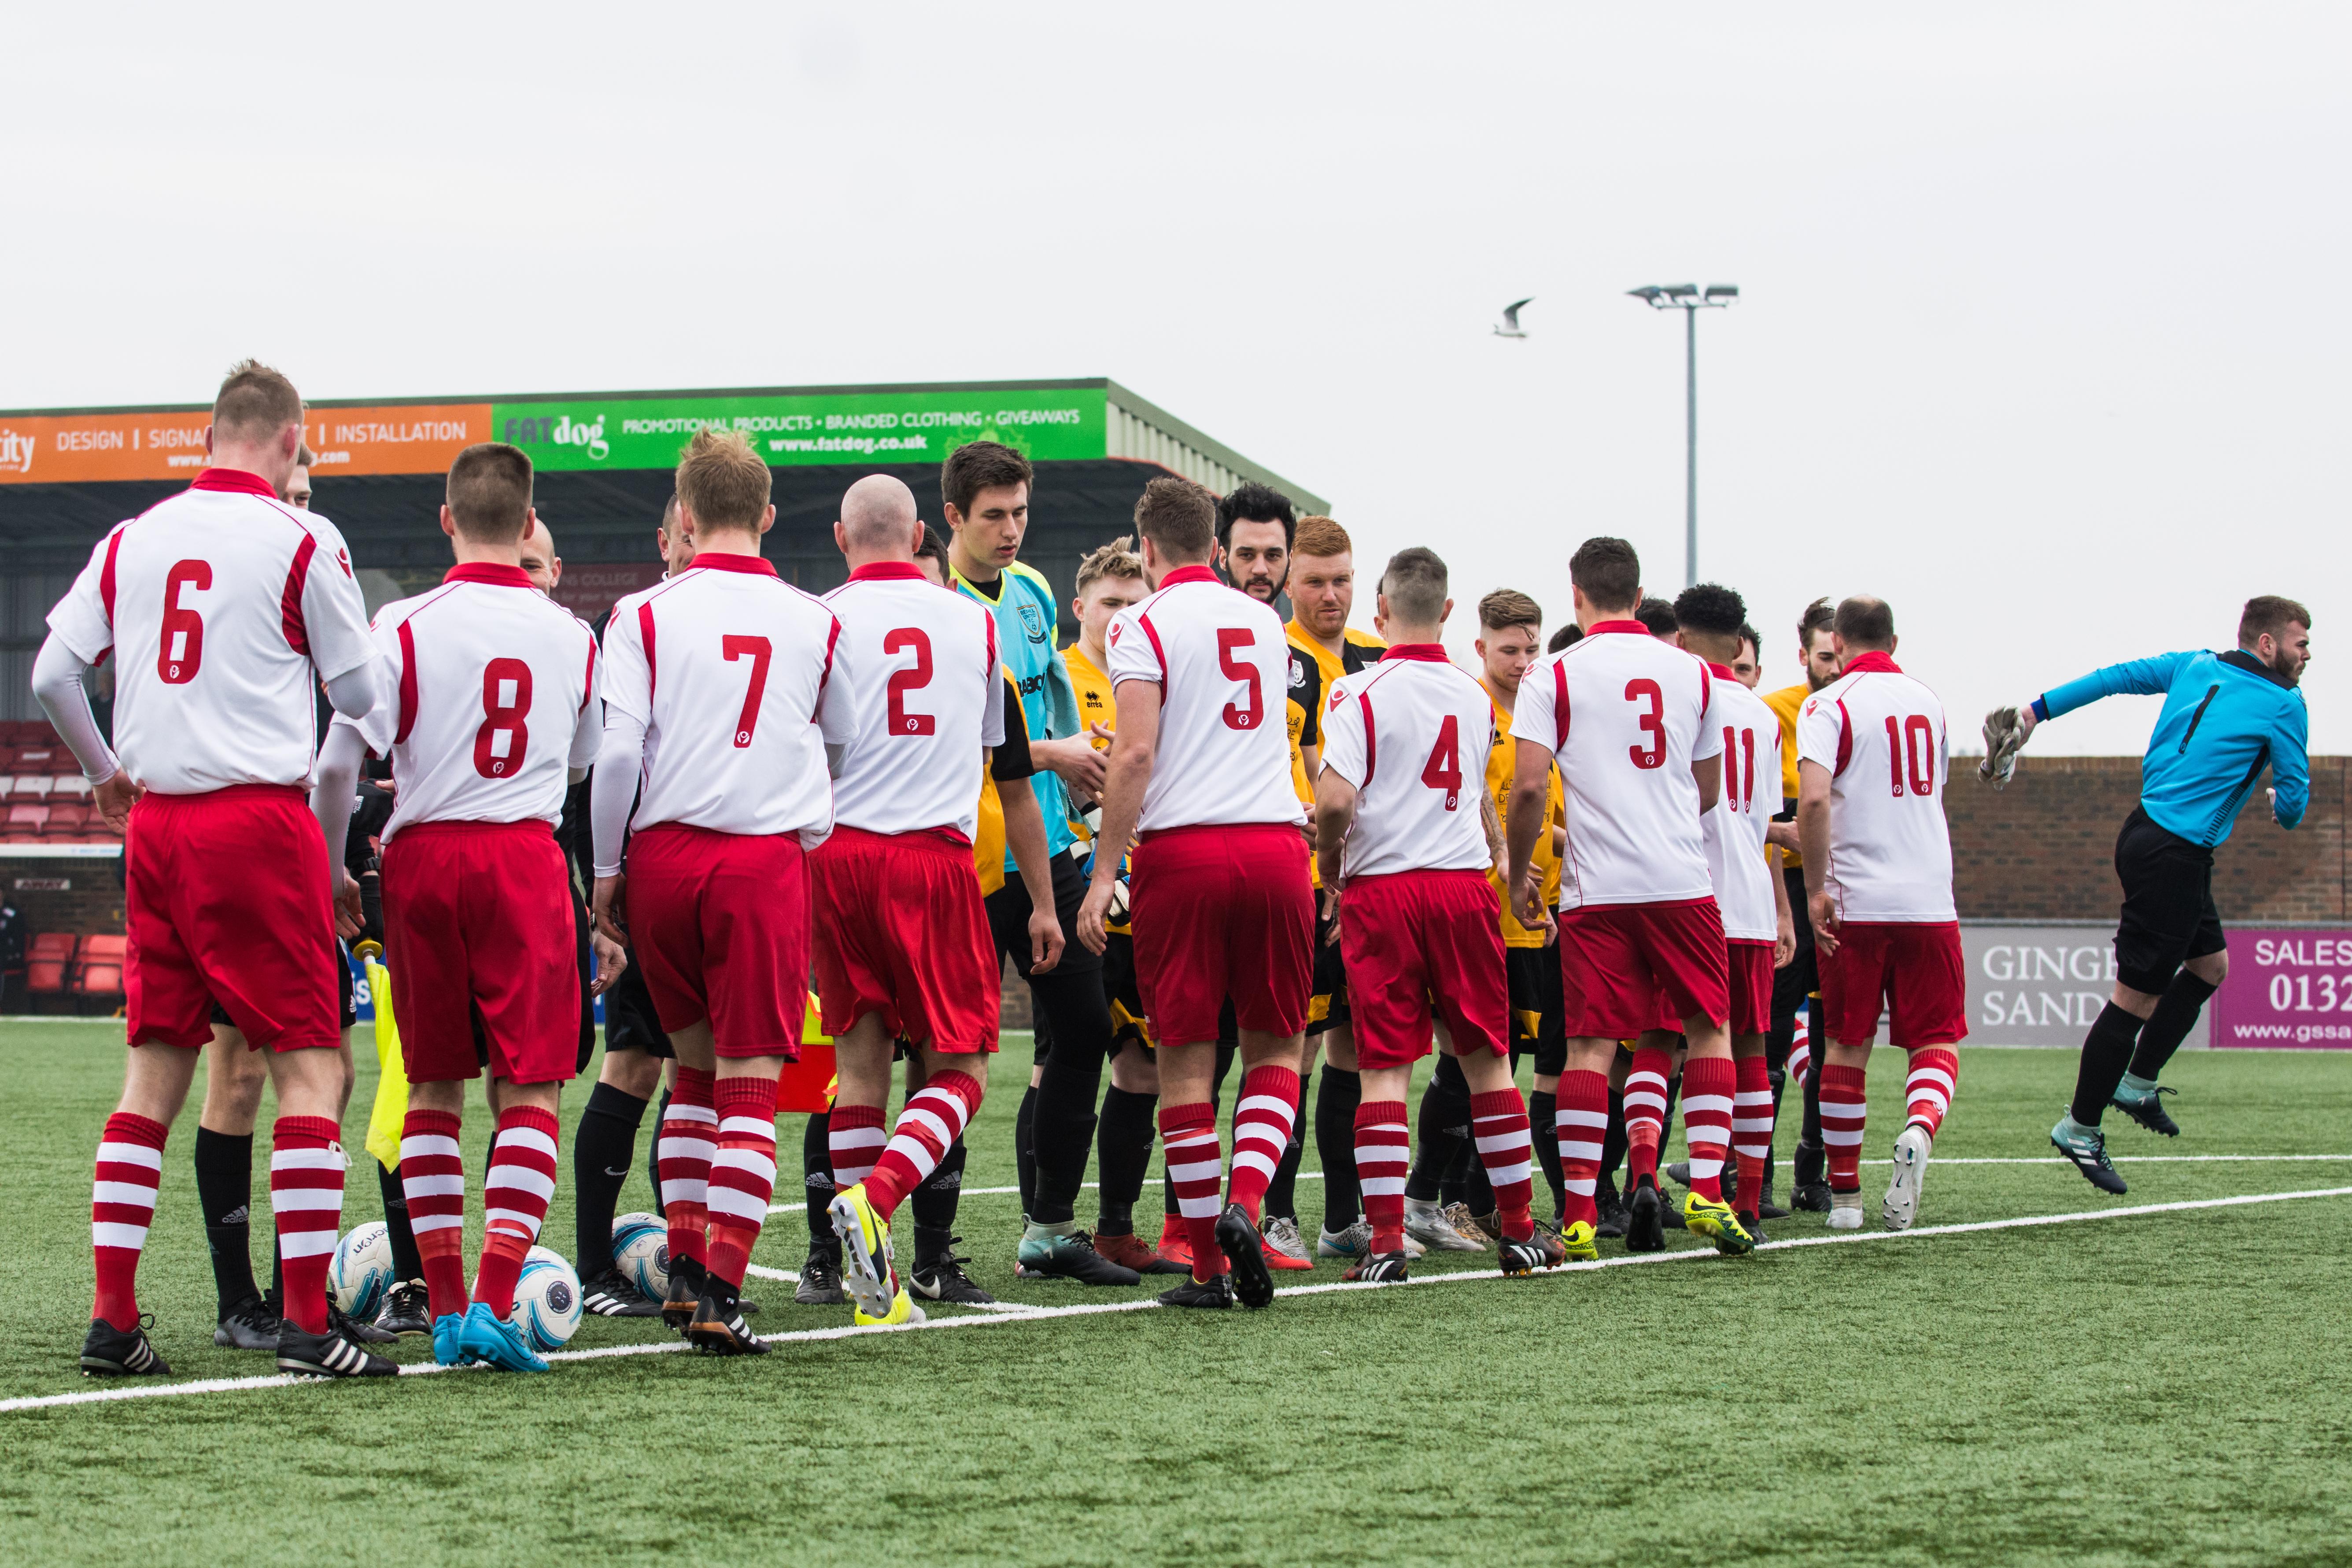 DAVID_JEFFERY Langney Wanderers FC vs Bexhill United FC 03.03.18 27